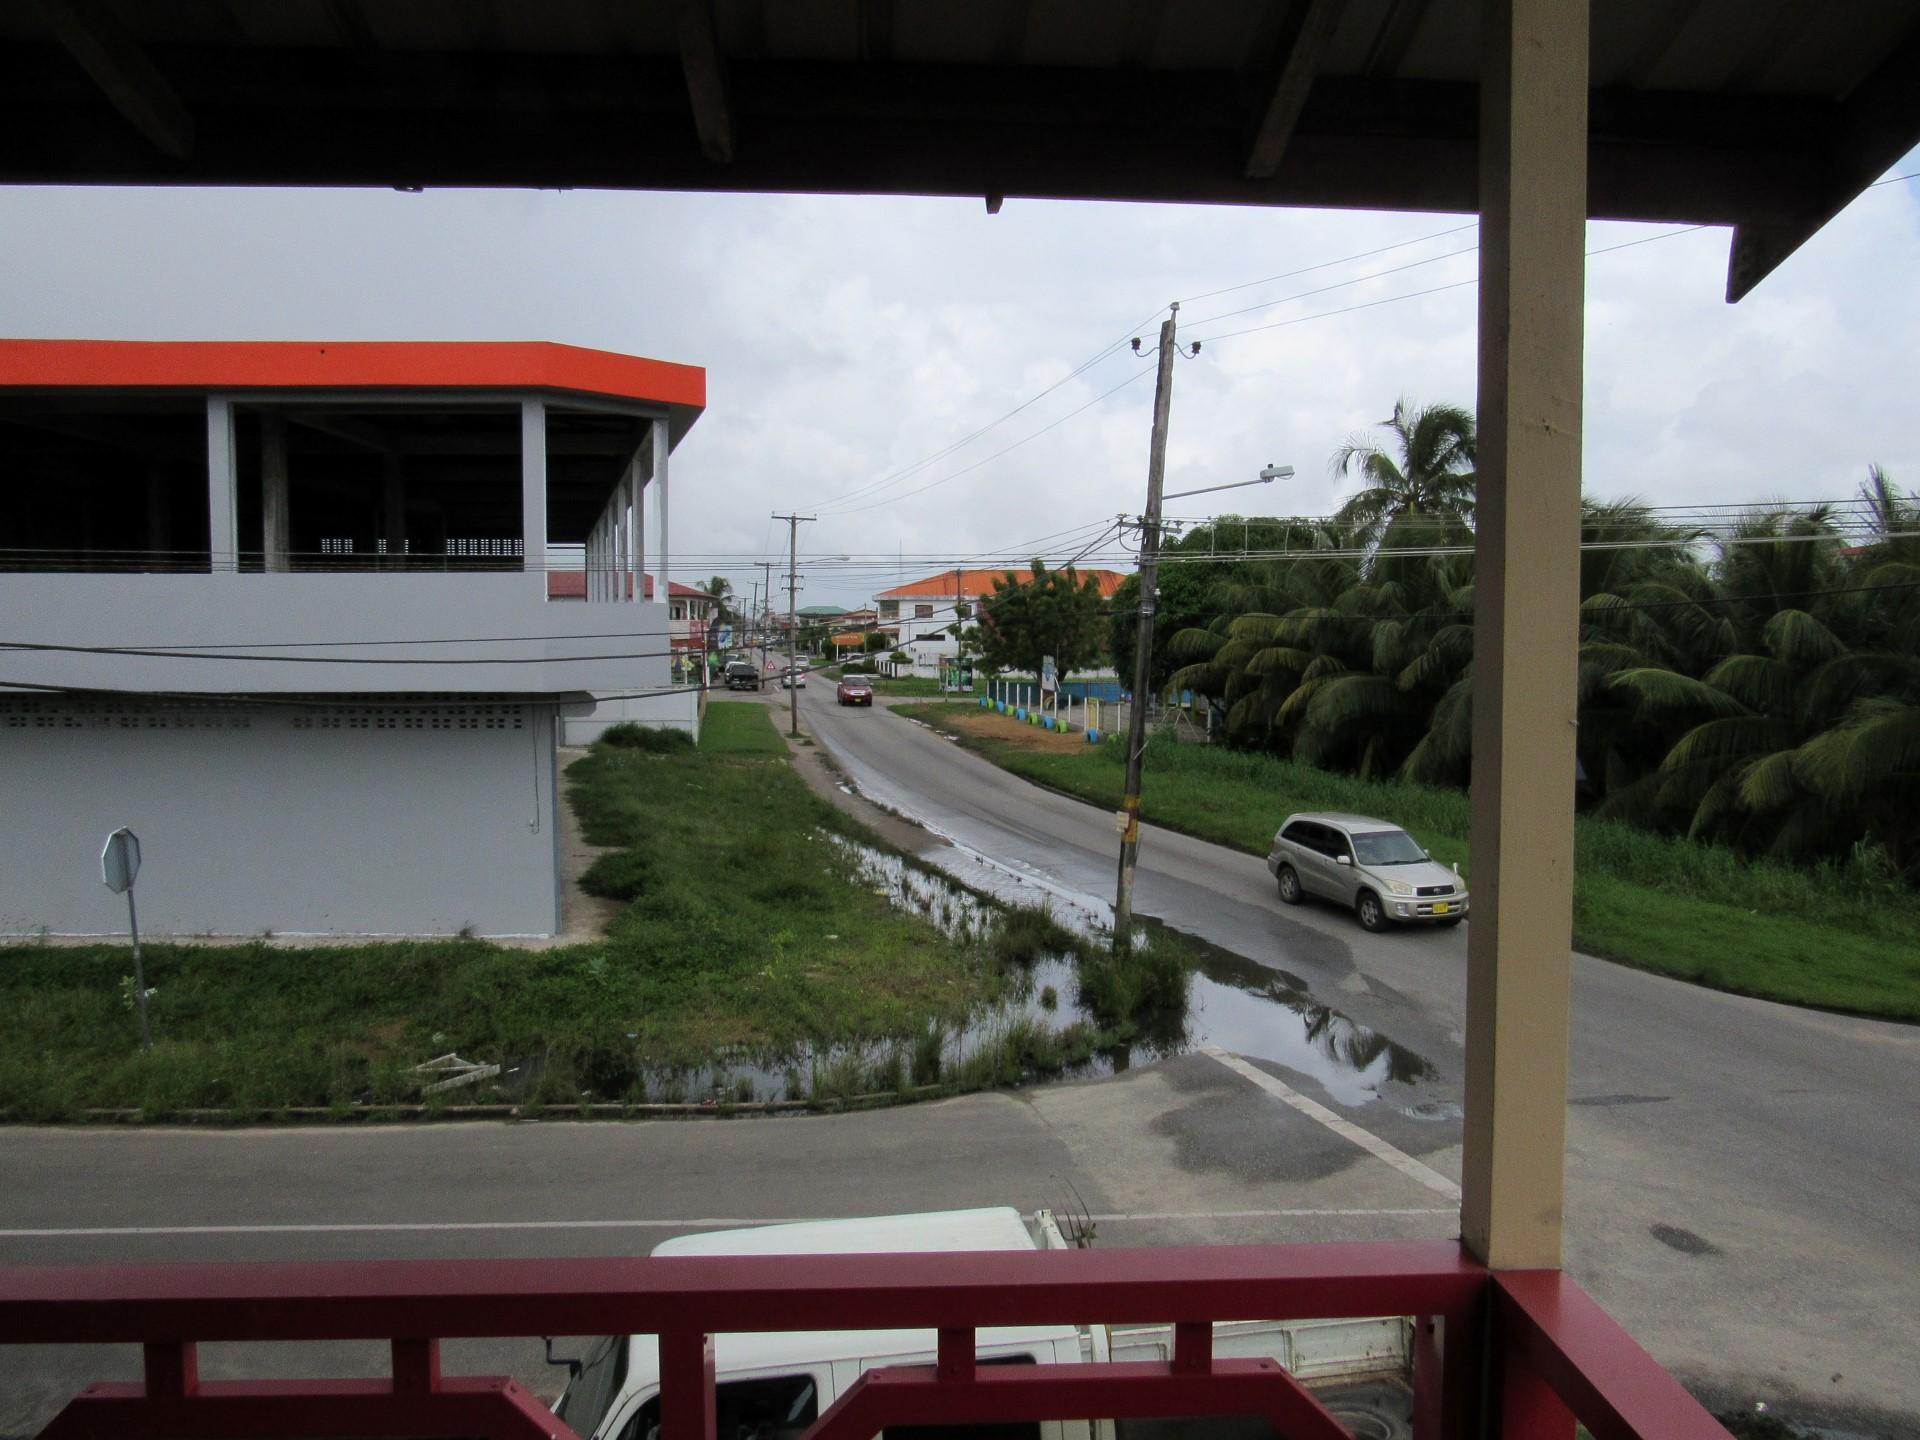 Henkielaan-32-Koopwoning-Terzol-Vastgoed-Paramaribo-Suriname-27